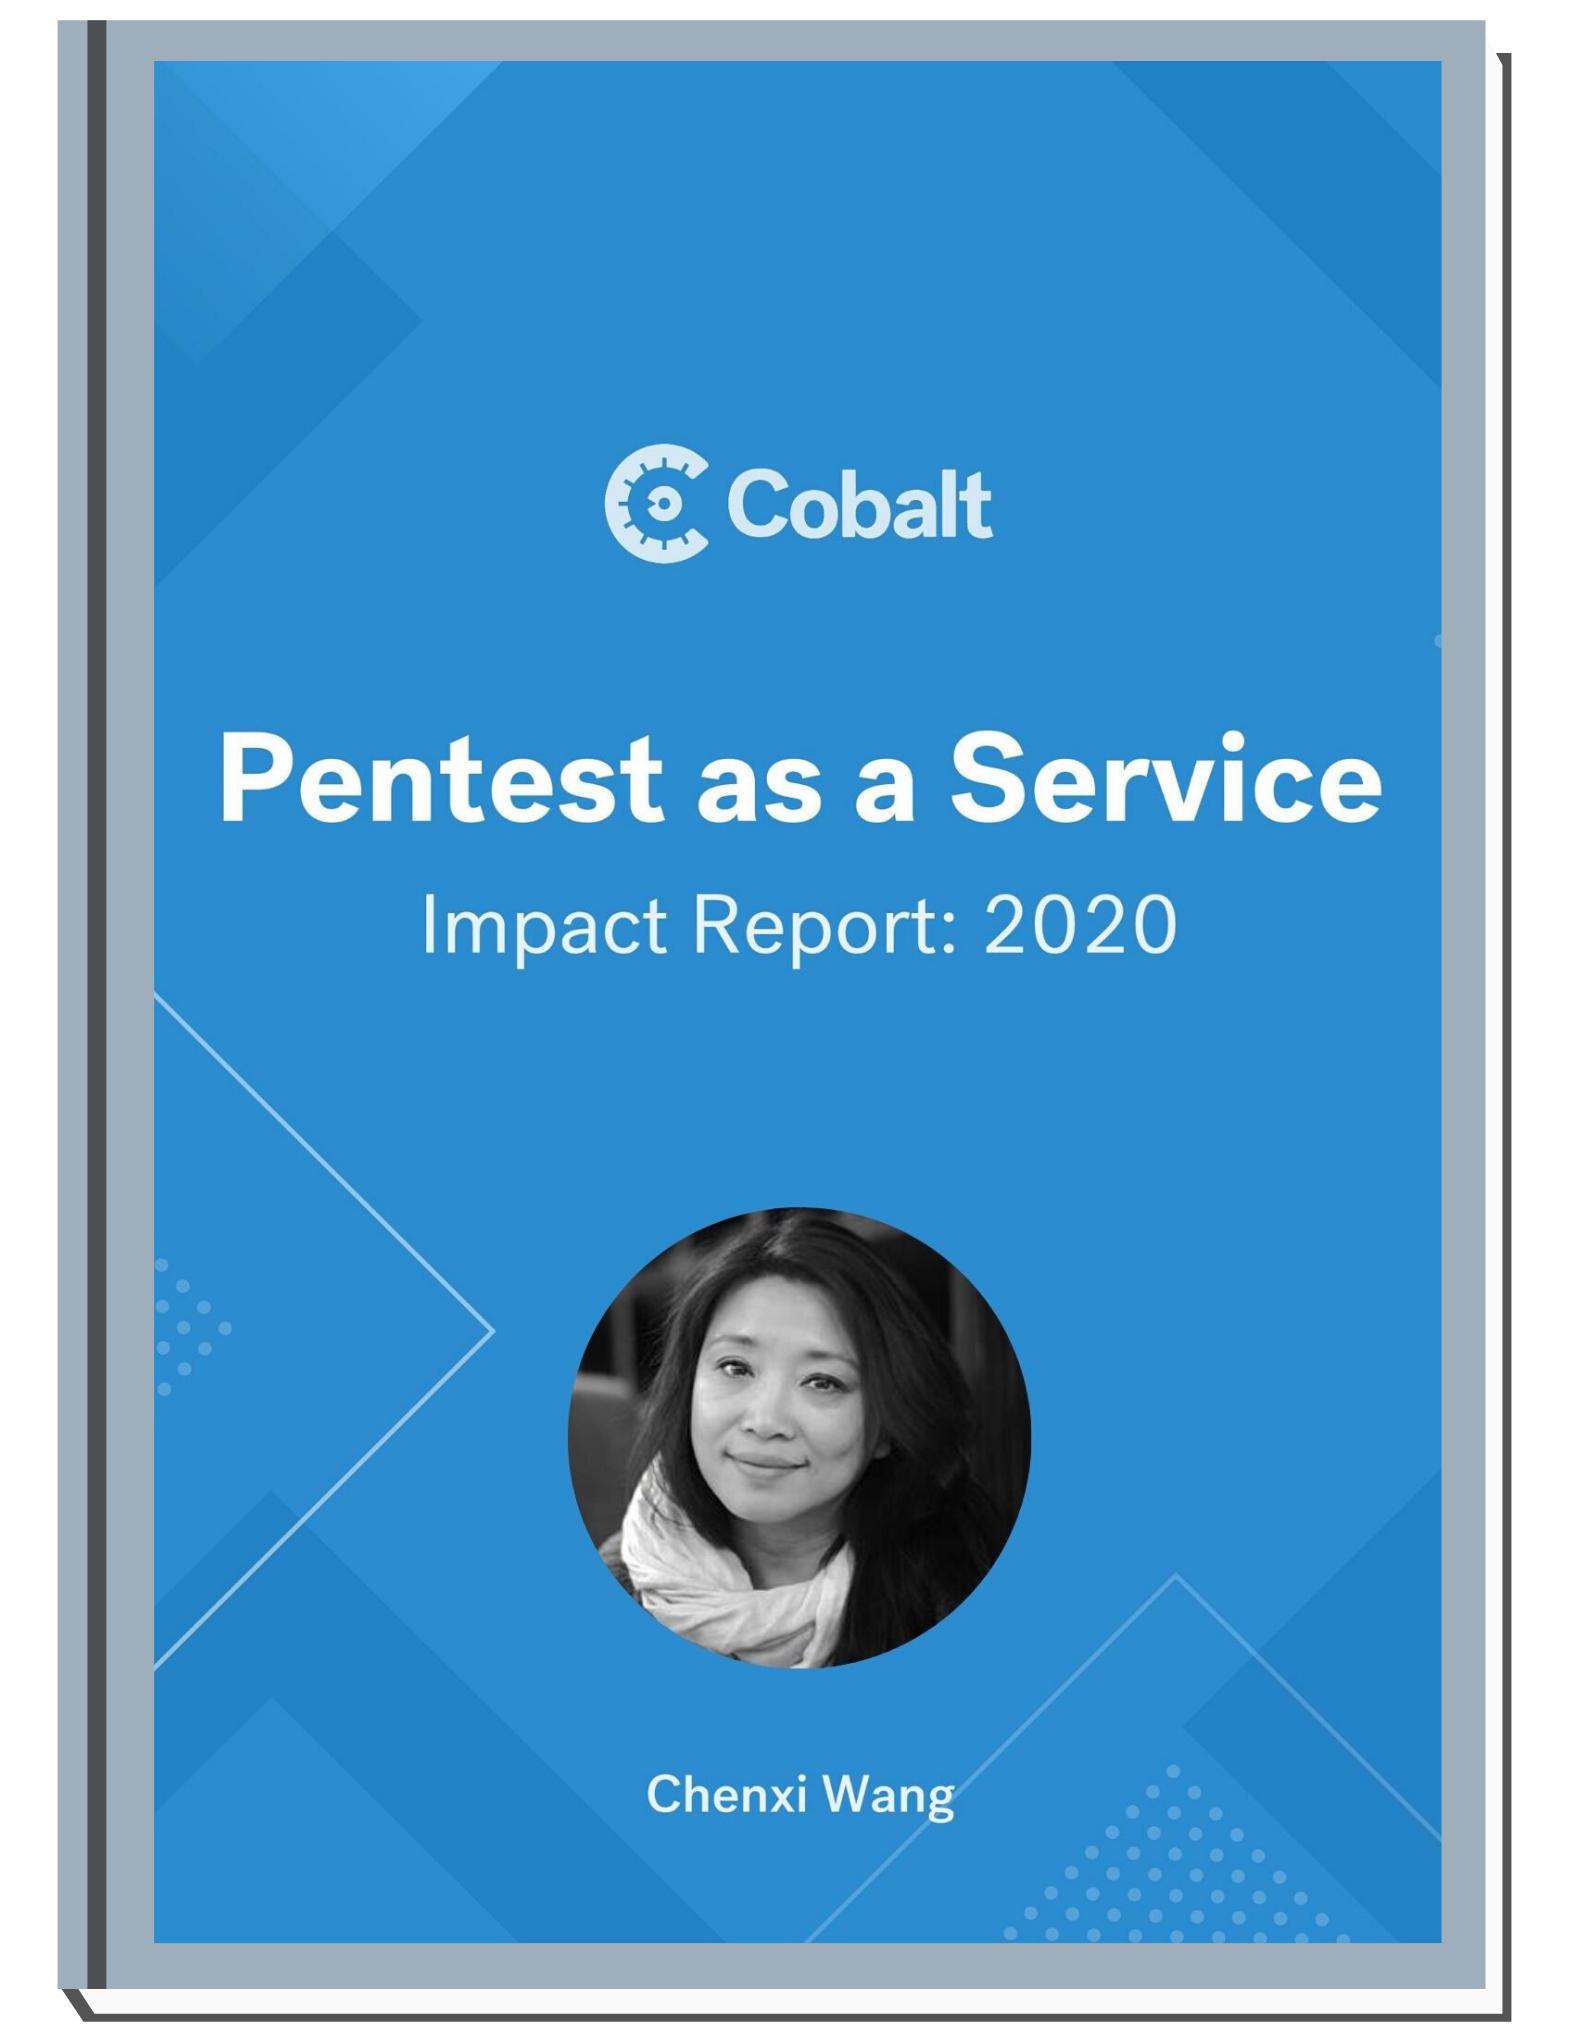 Pentest as a Service Impact Report 2020